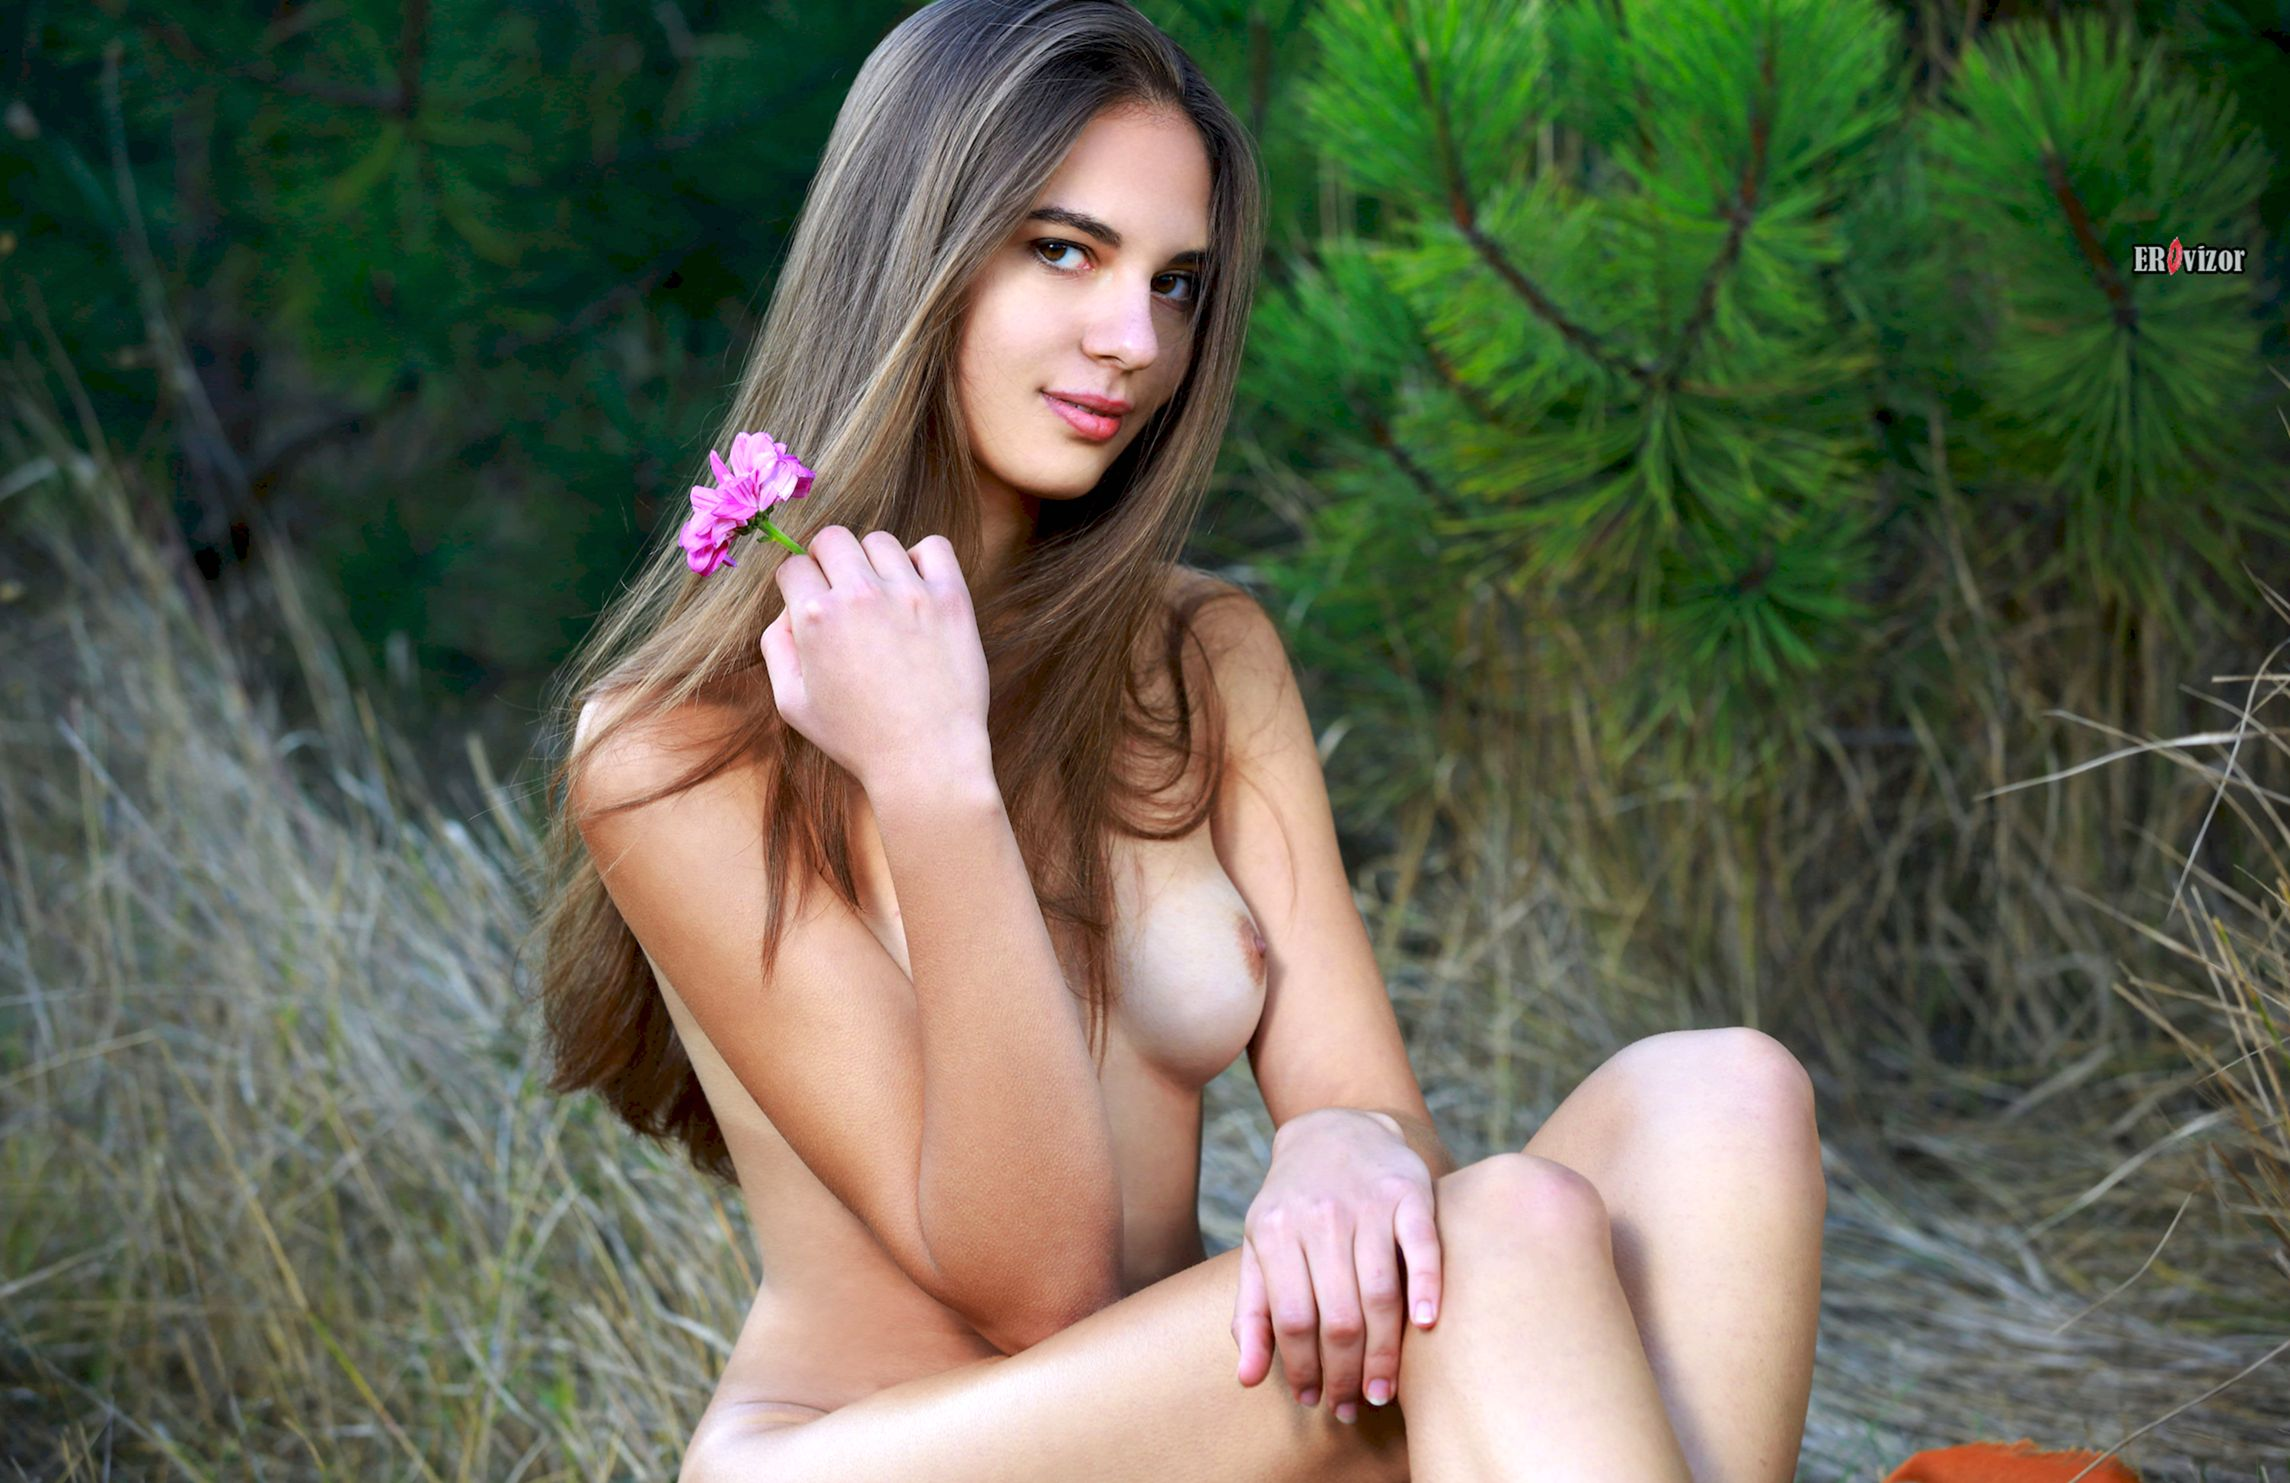 stroinaya_na_prirode_flower (18)